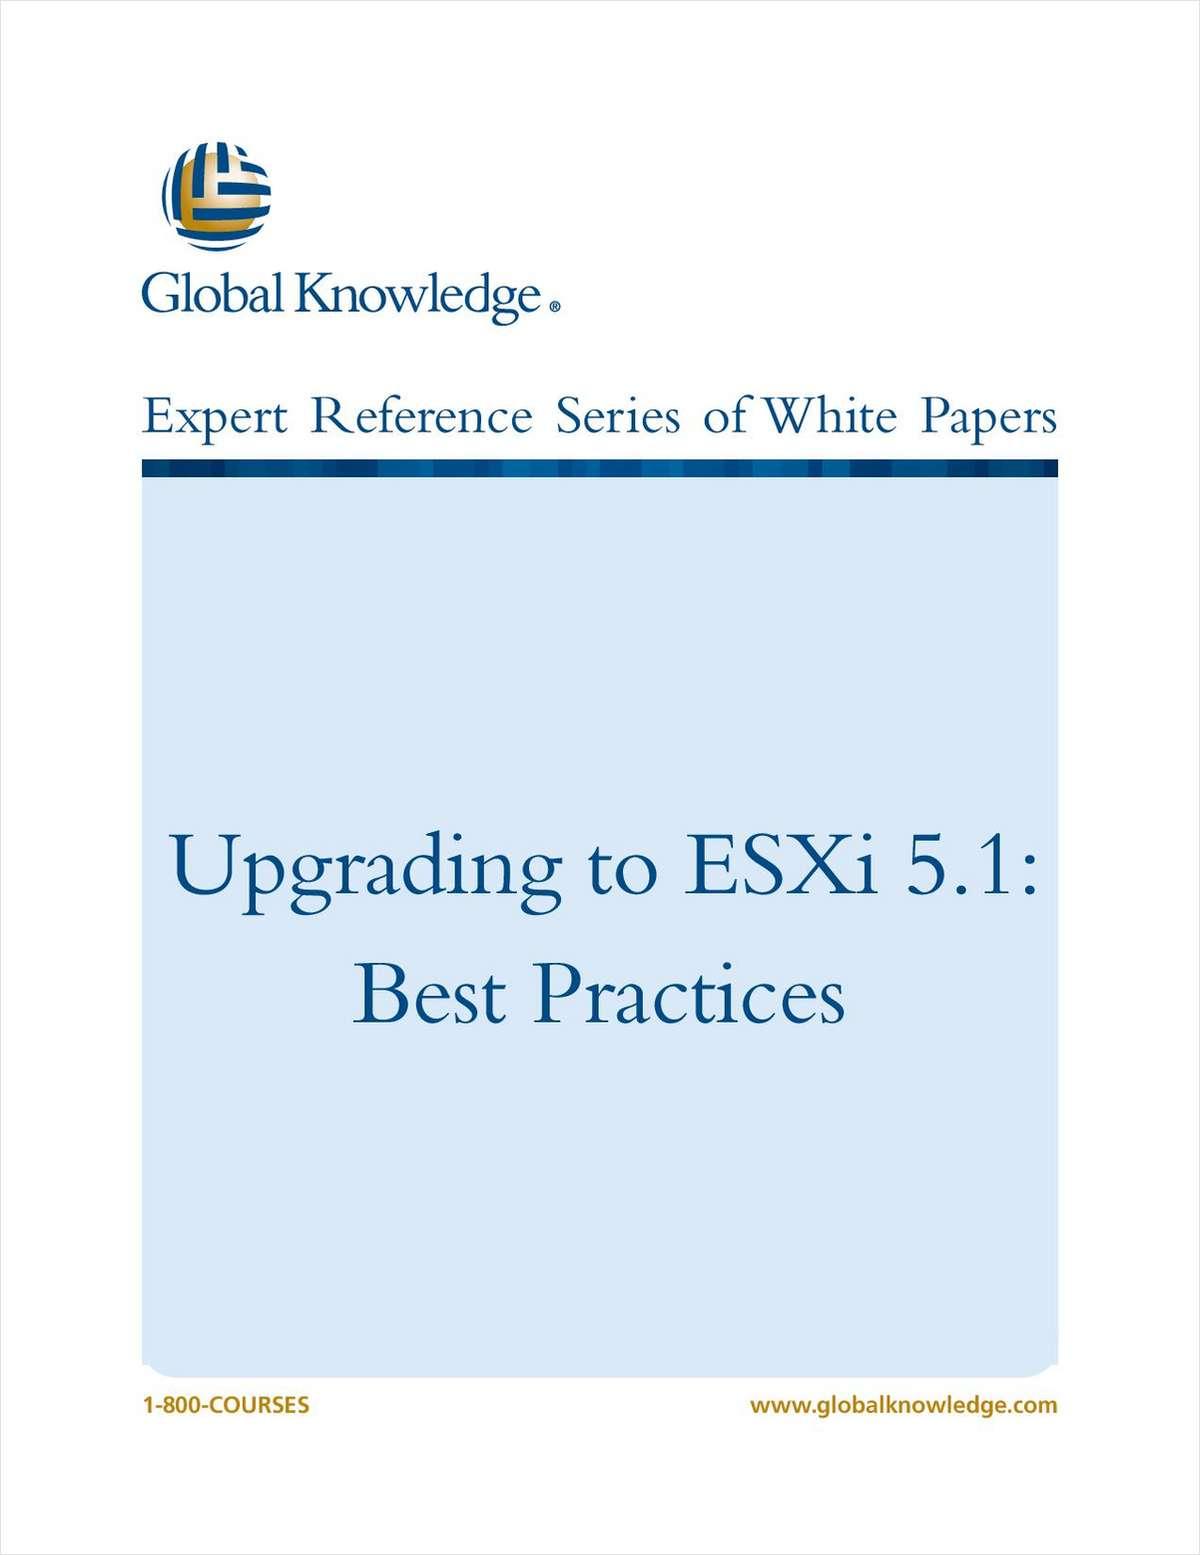 Upgrading to ESXi 5.1 - Best Practices